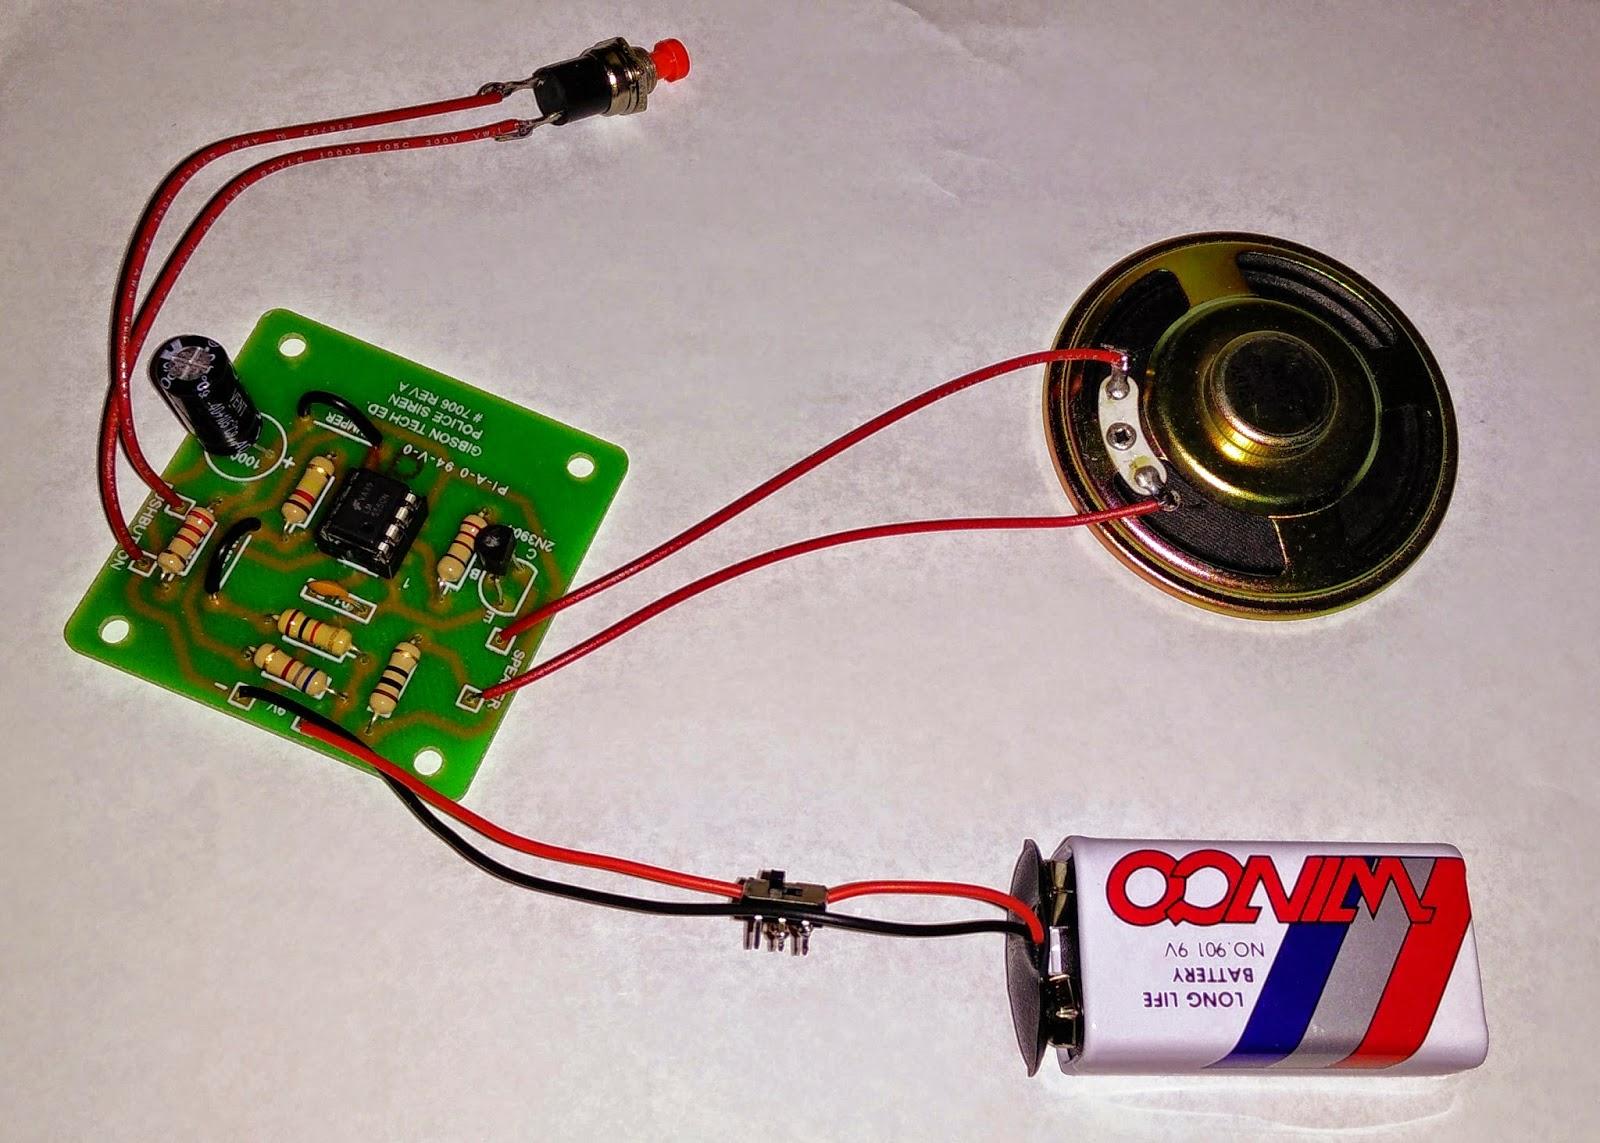 Anites Electronics Merit Badge